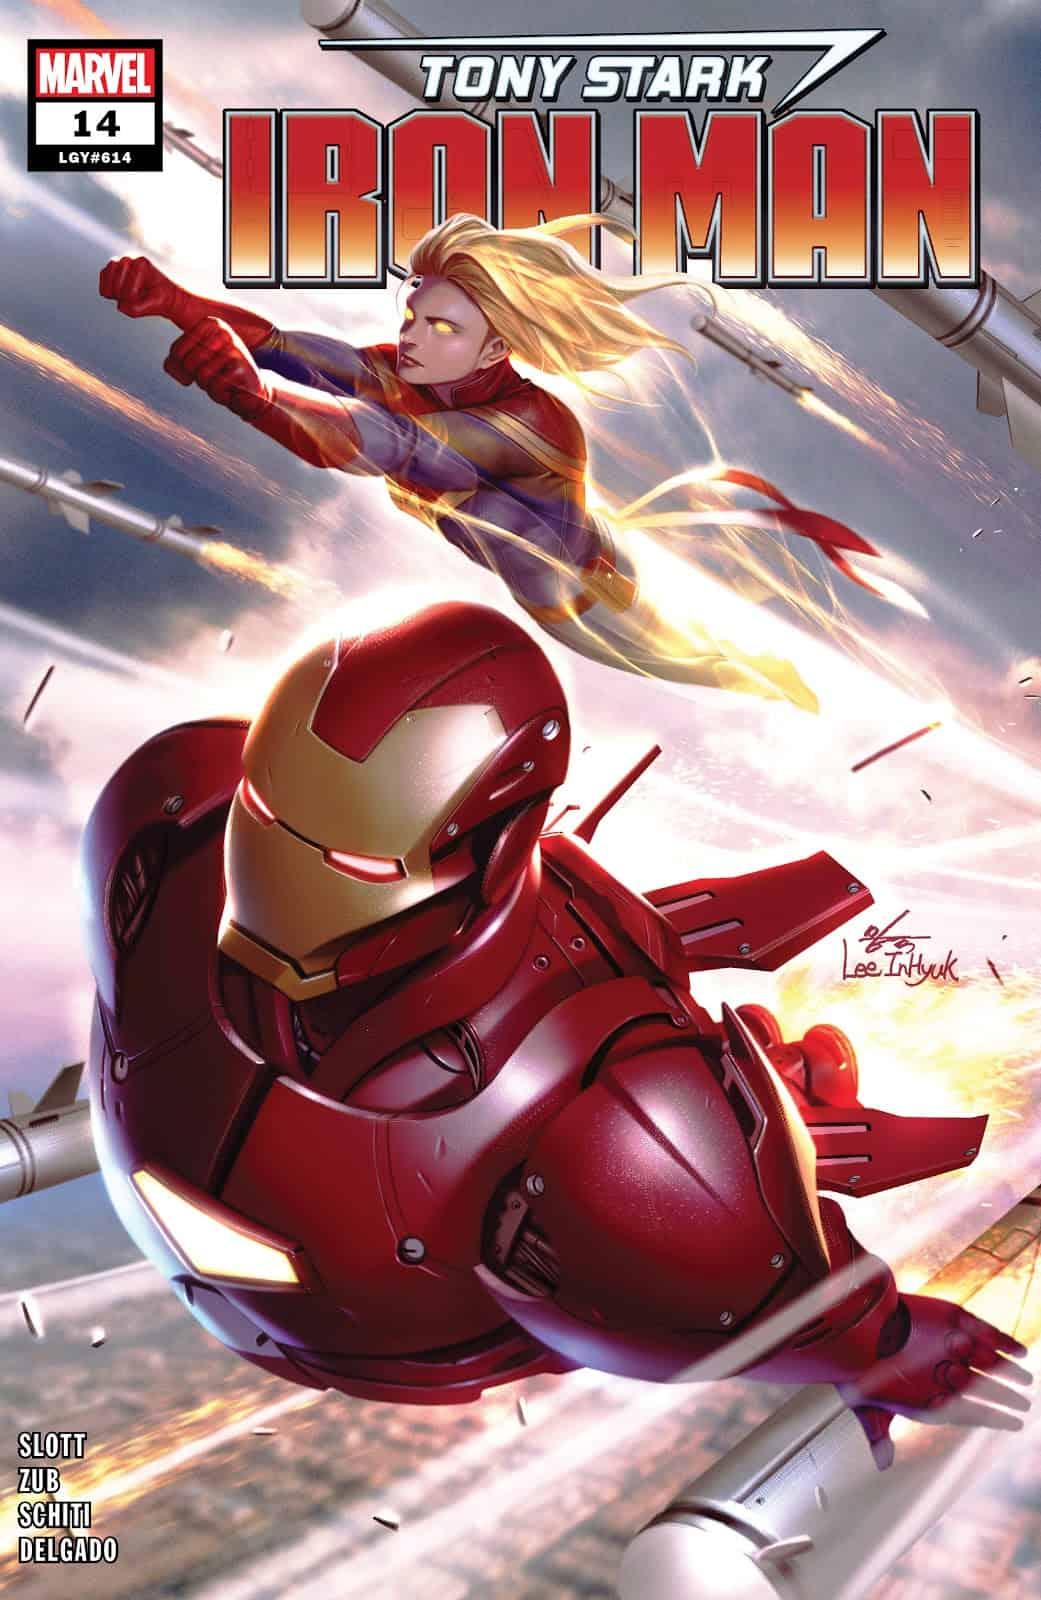 tony stark iron man 14